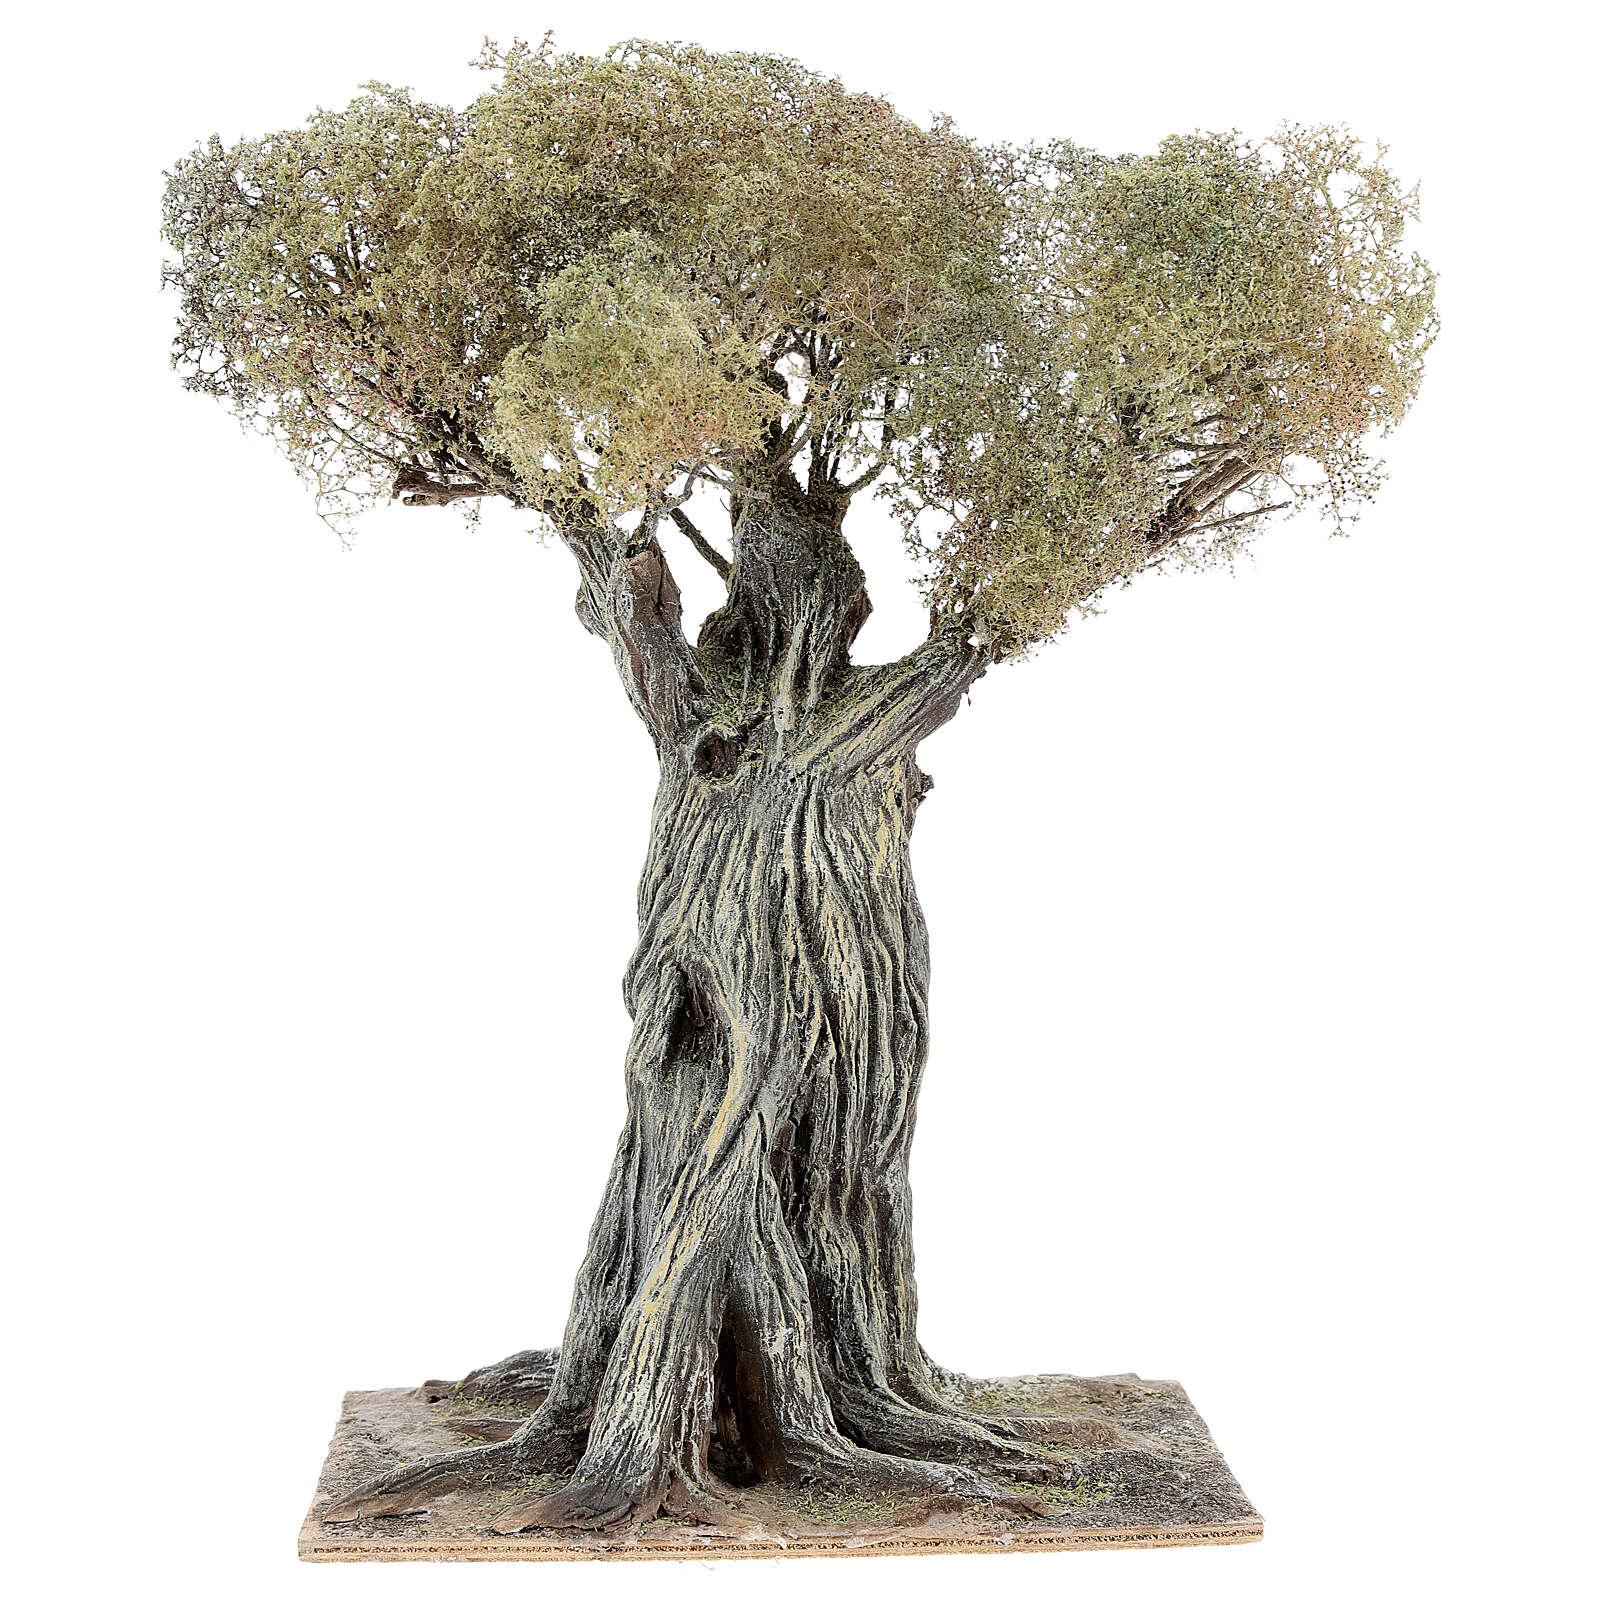 Árbol olivo belén napolitano 30 cm cartón piedra madera 4